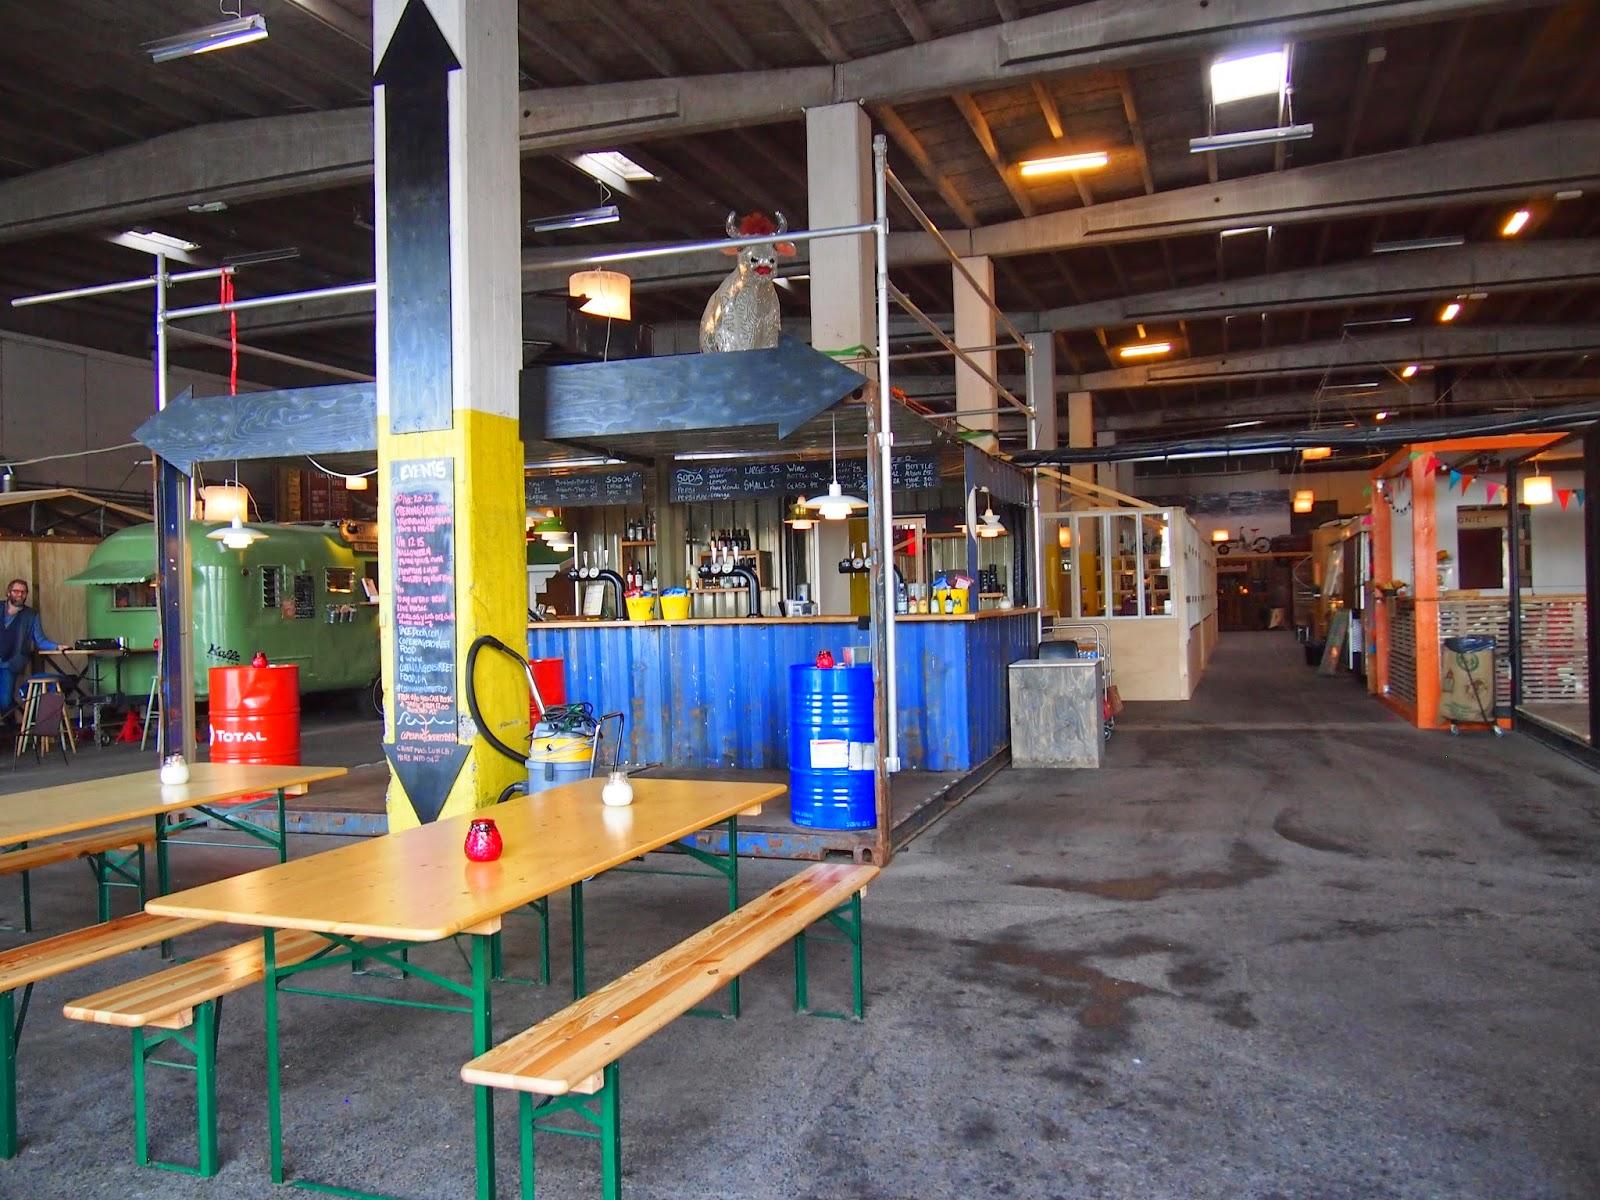 inside the food market of paprioen